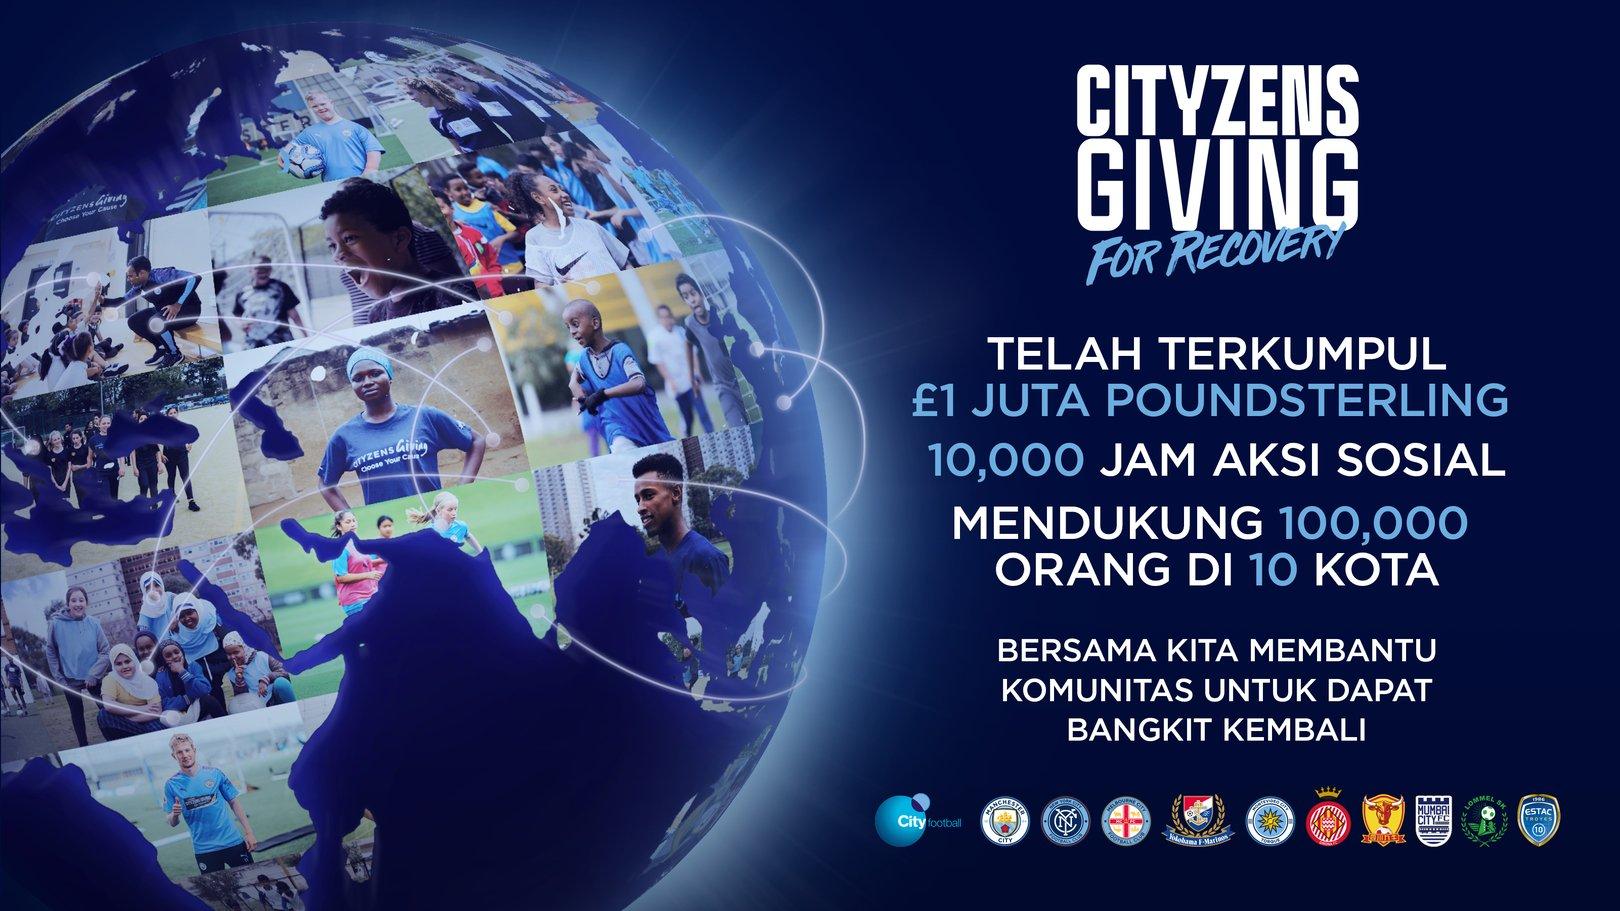 CFG Merayakan Kesuksesan Besar Cityzens Giving For Recovery!